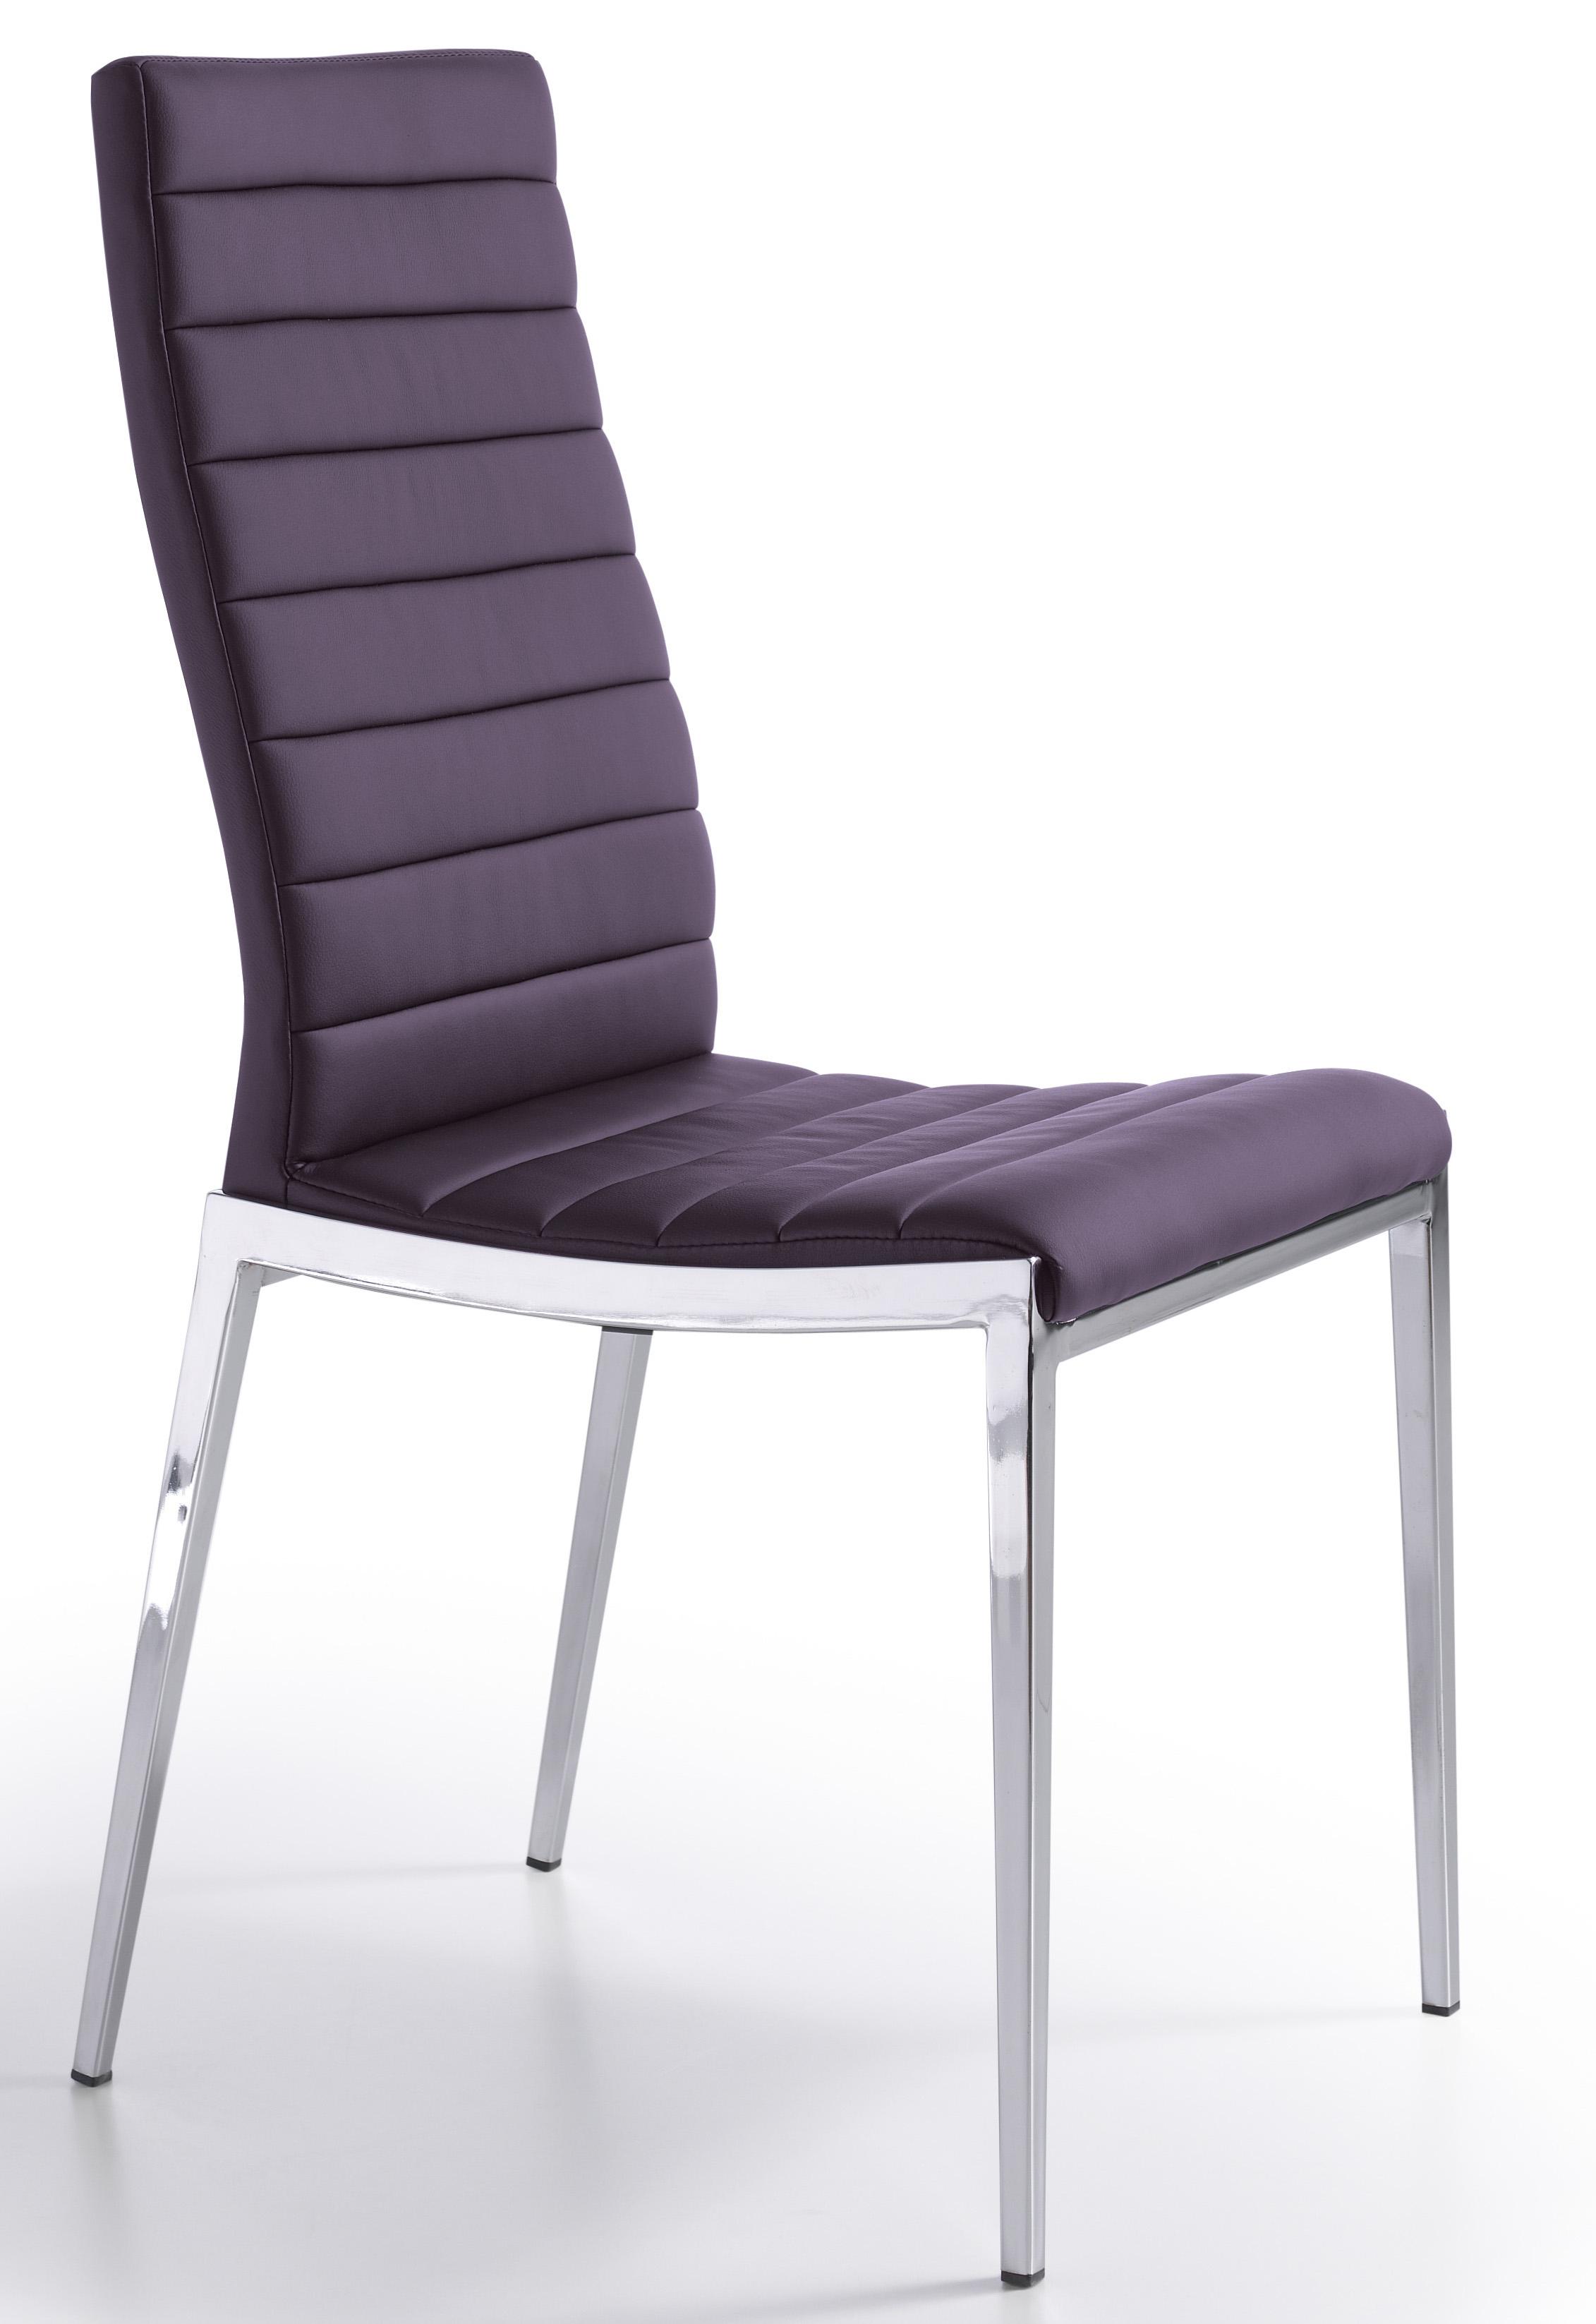 chaise design matelass e violet dona lot de 2. Black Bedroom Furniture Sets. Home Design Ideas